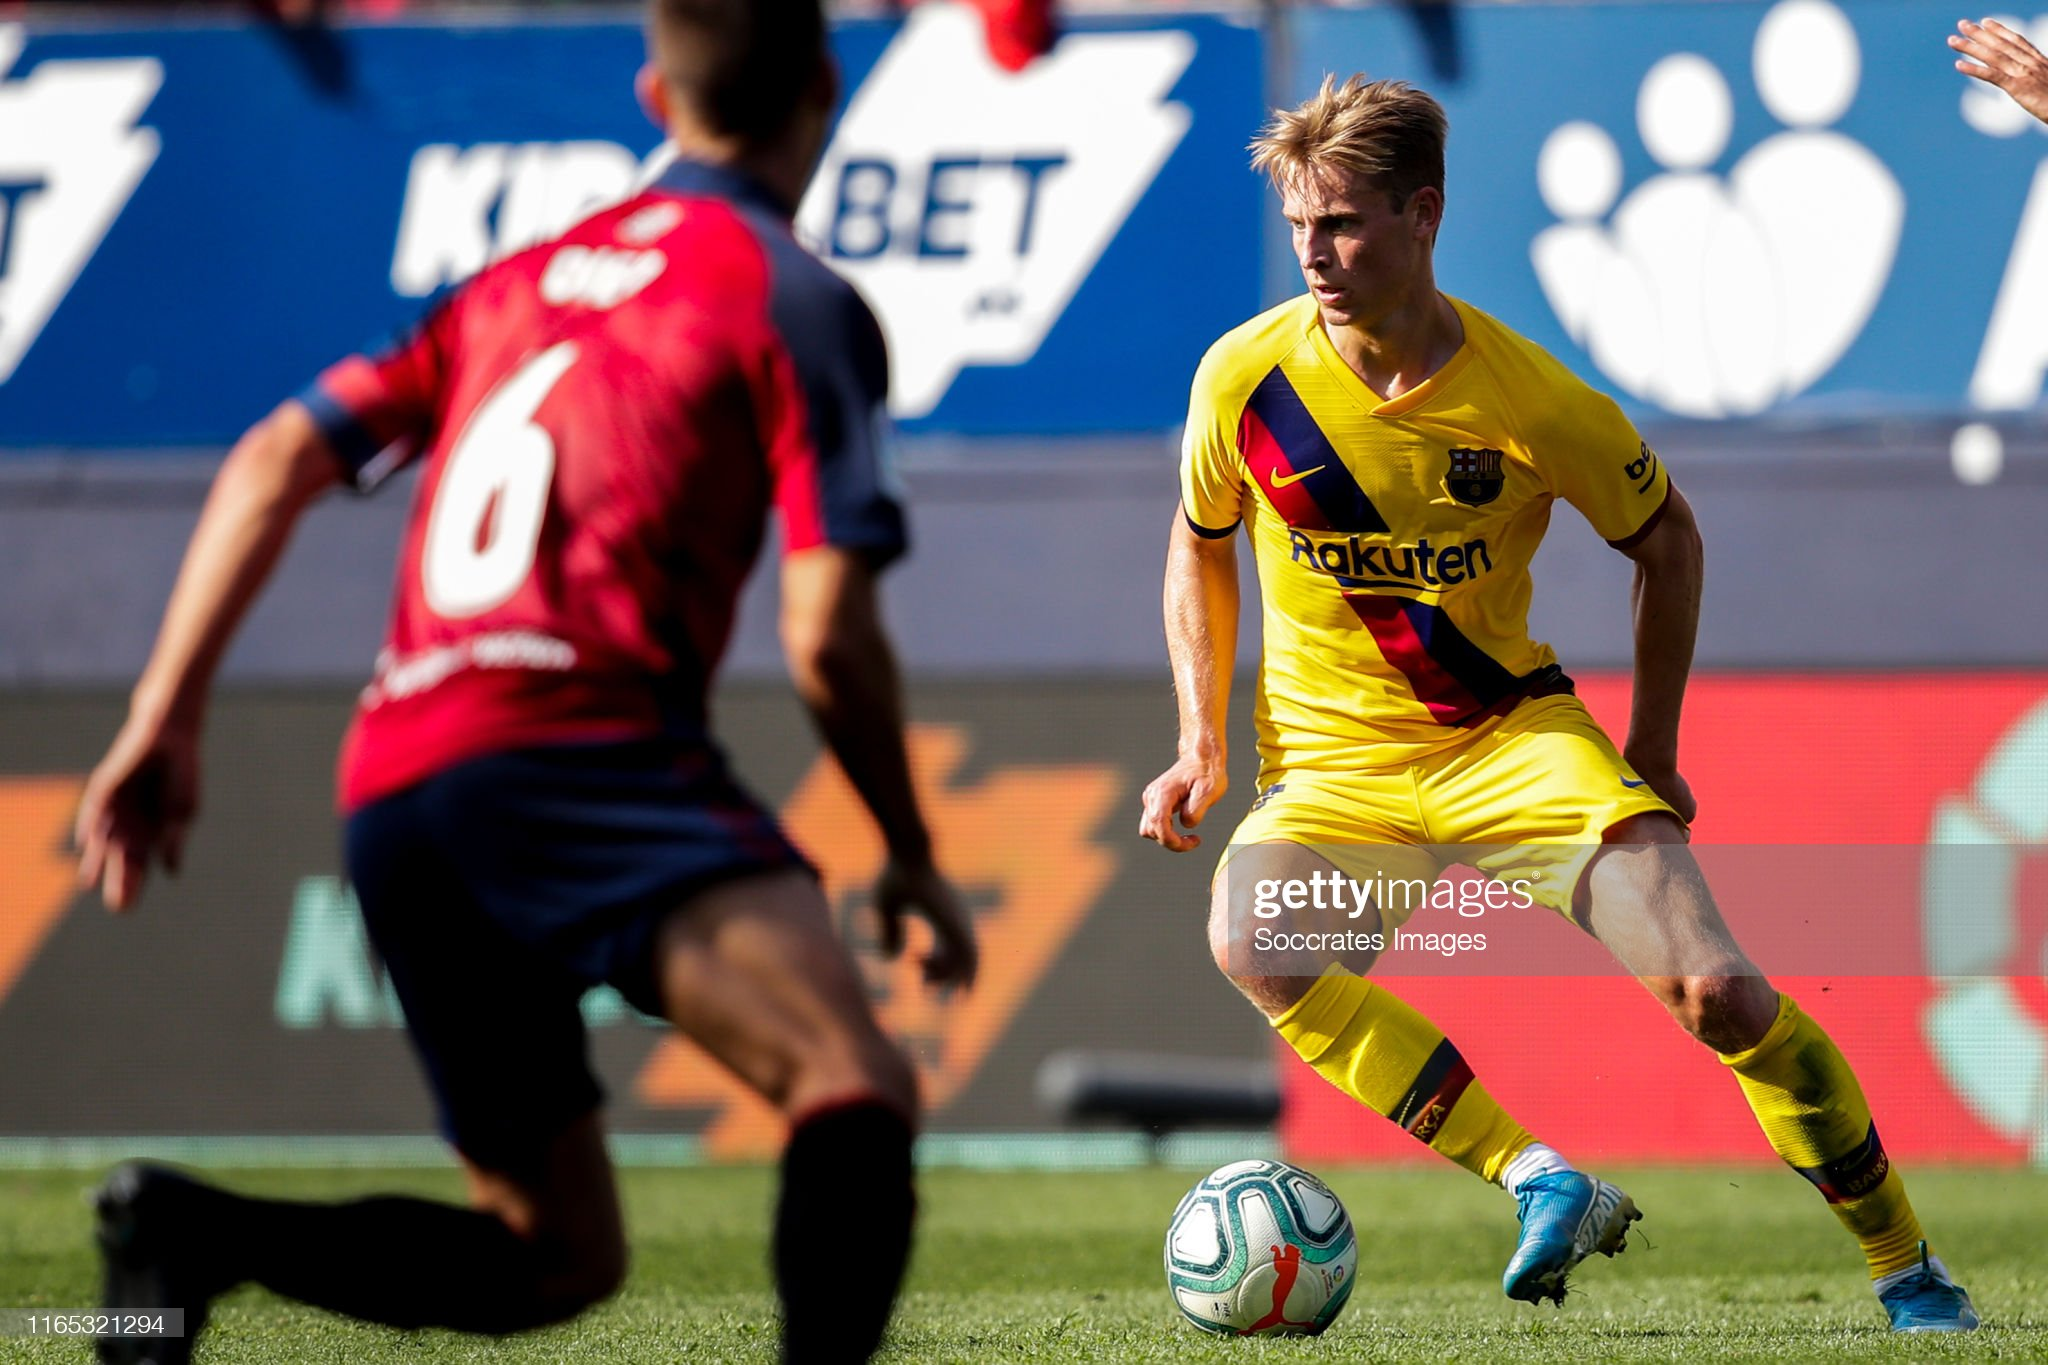 صور مباراة : أوساسونا - برشلونة 2-2 ( 31-08-2019 )  Frenkie-de-jong-of-fc-barcelona-during-the-la-liga-santander-match-picture-id1165321294?s=2048x2048